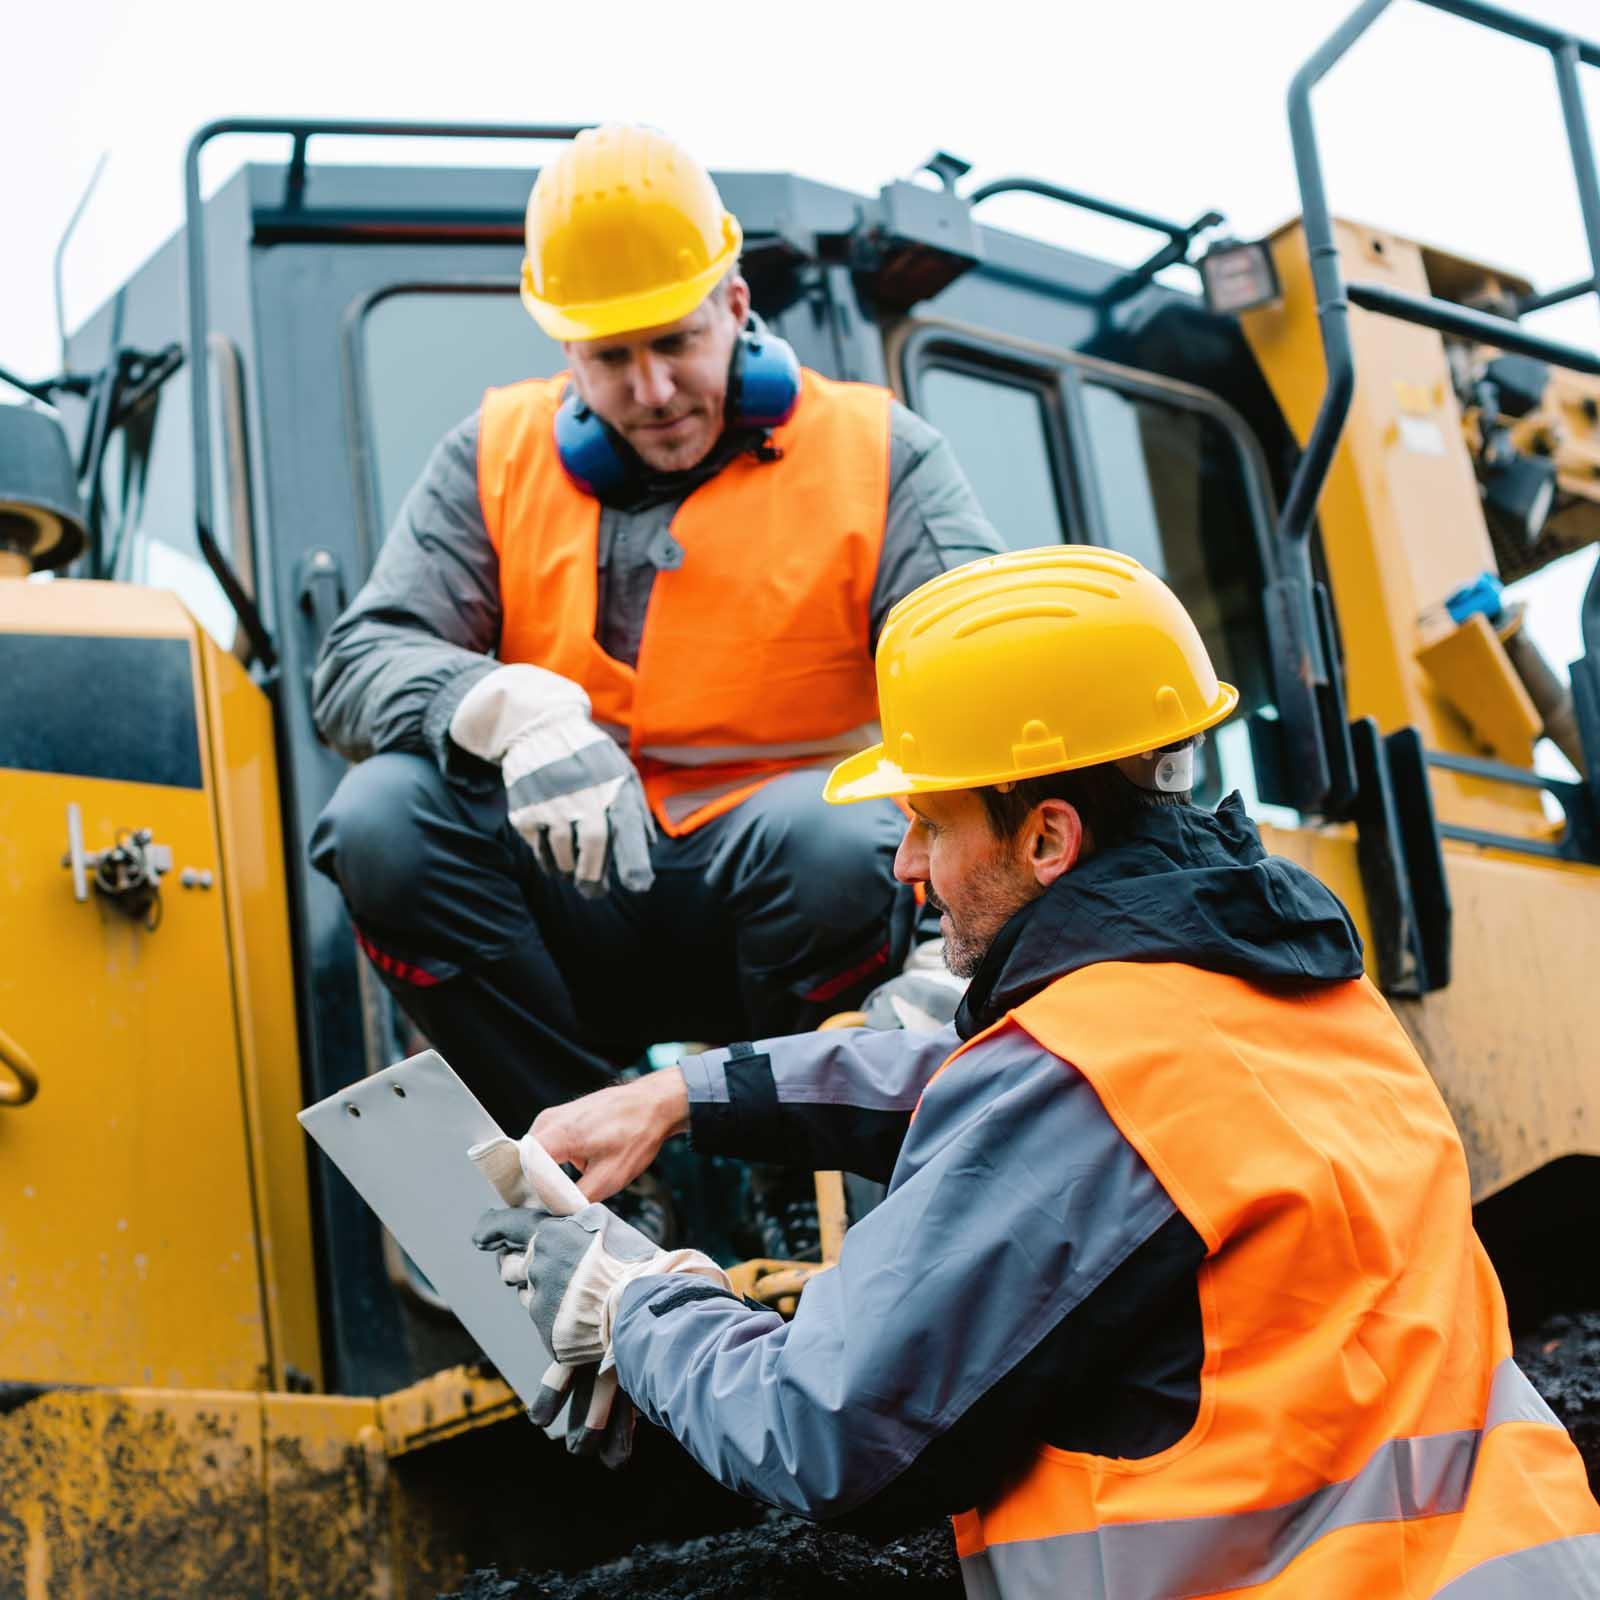 integrations-urbint-worker-safety